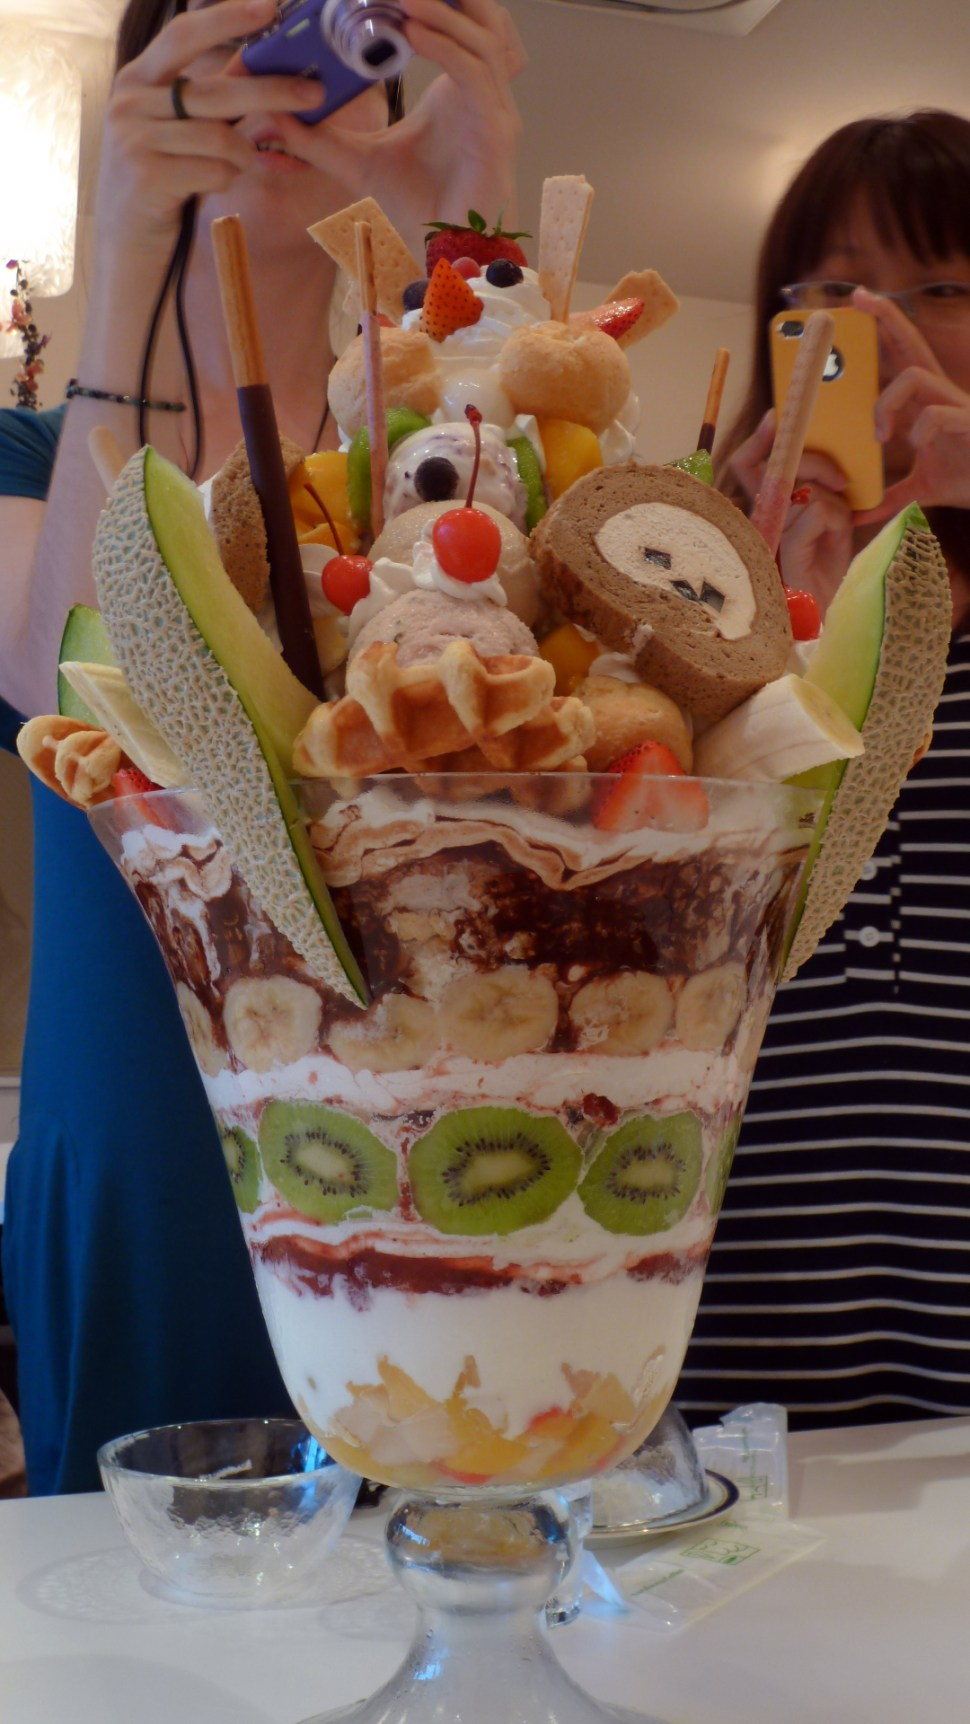 Parfaitzilla: the dessert that ate Japan